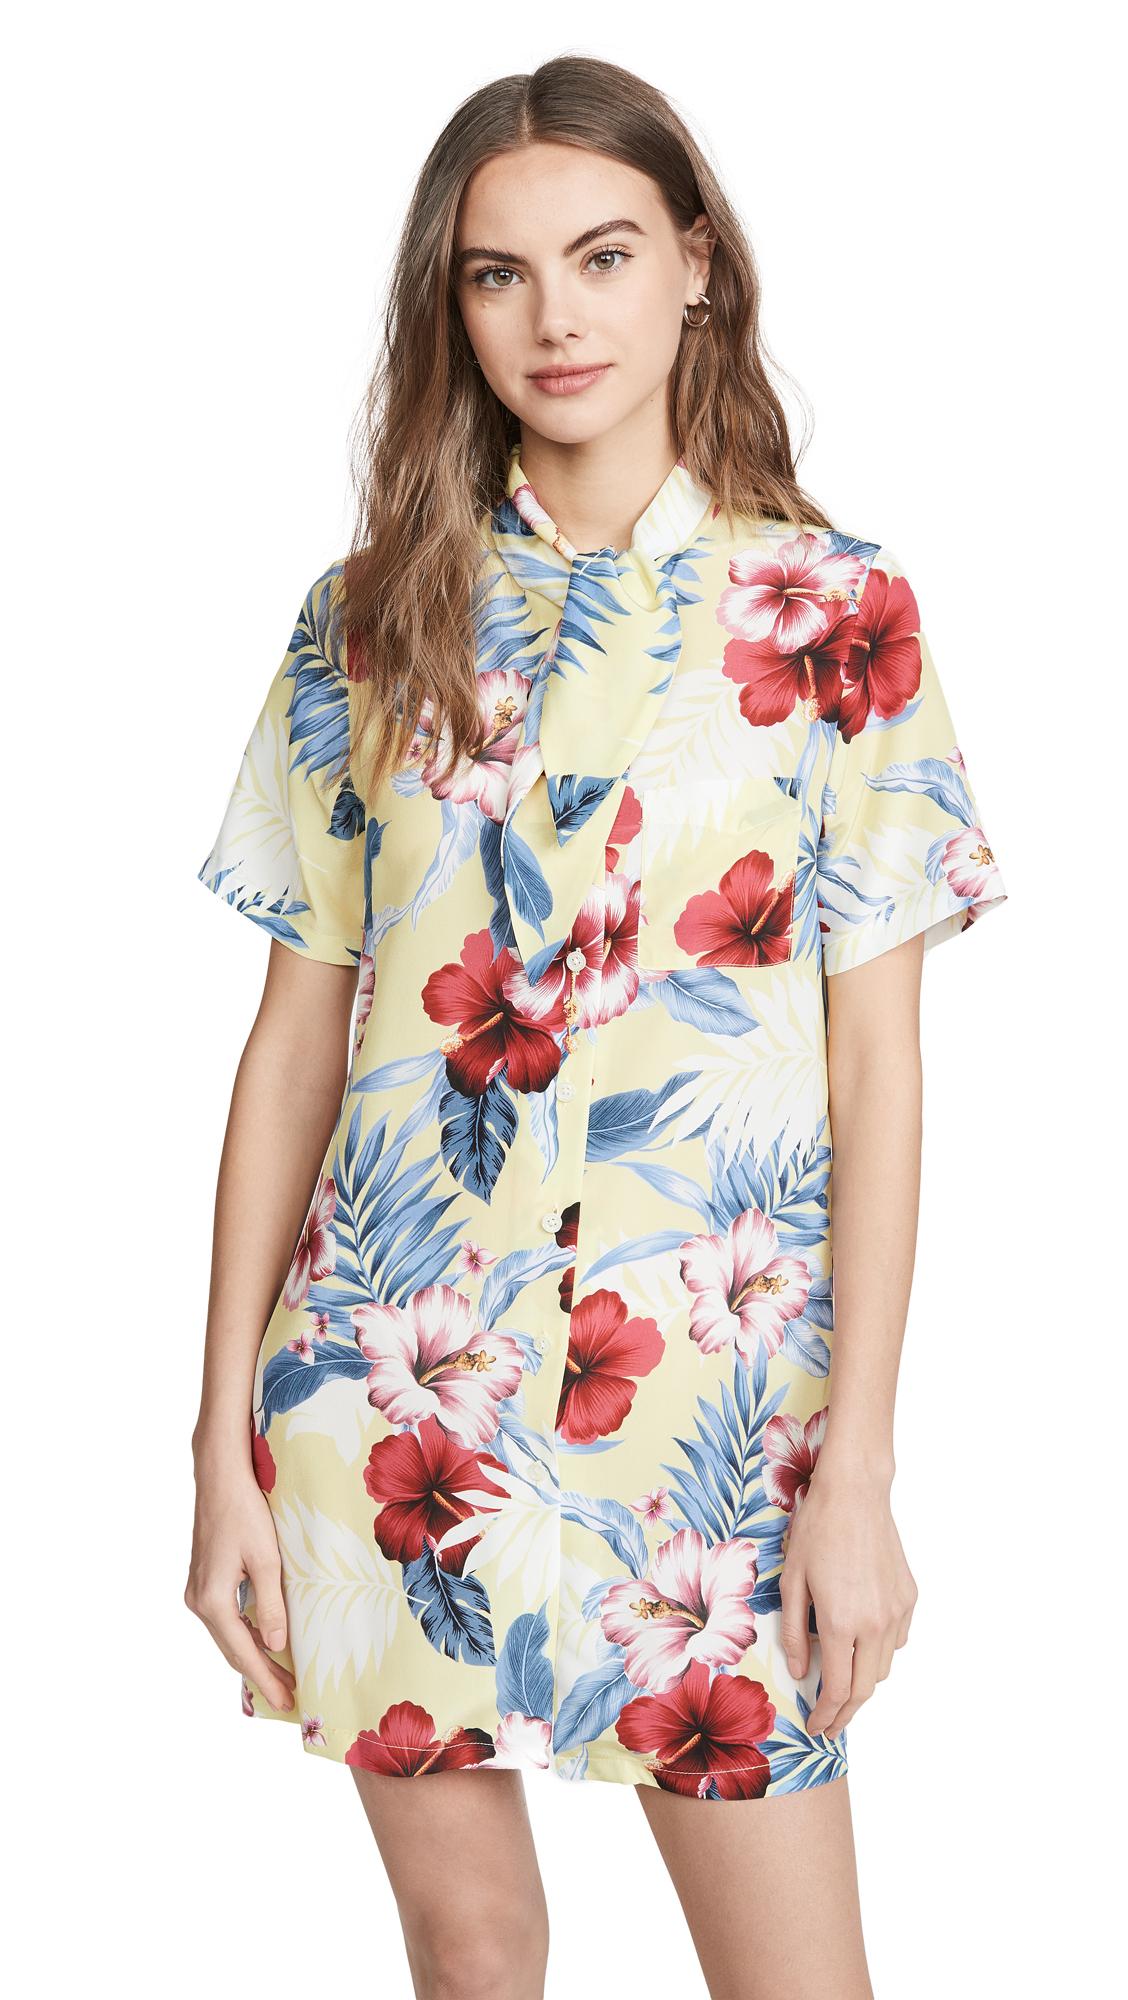 Buy LES REVERIES Silk Scarf Dress online beautiful LES REVERIES Clothing, Dresses